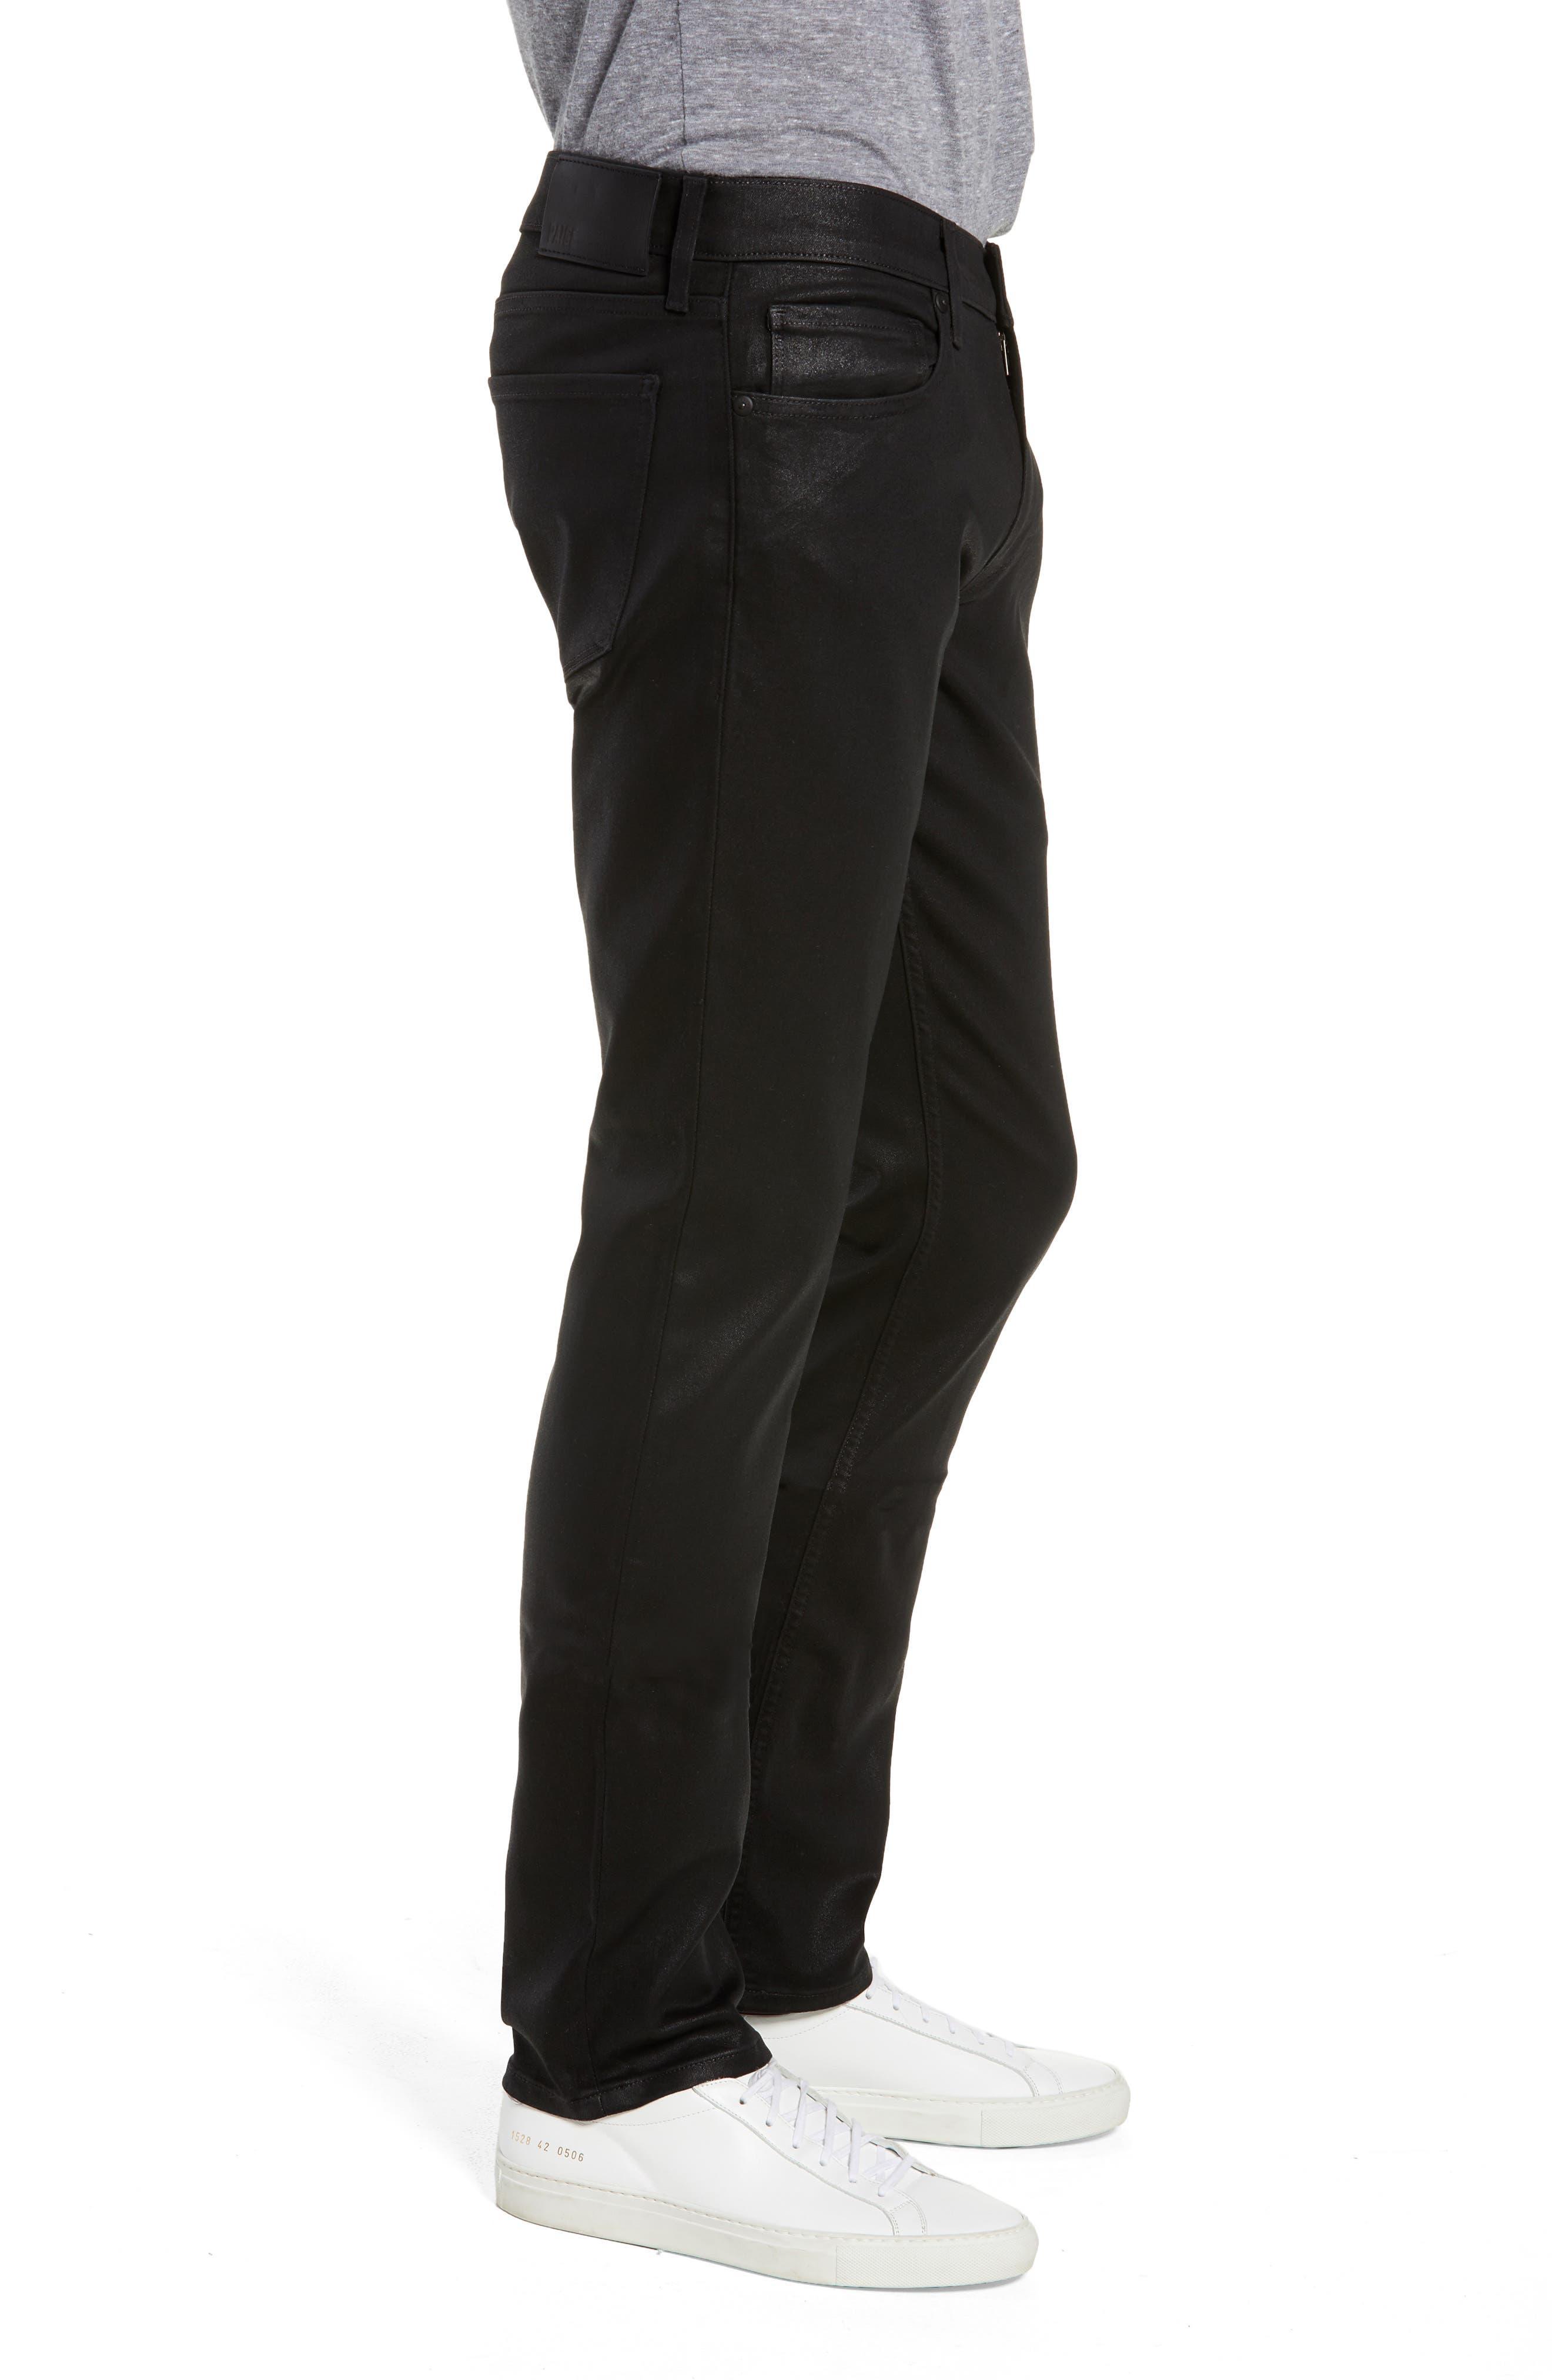 Transcend - Lennox Slim Fit Jeans,                             Alternate thumbnail 3, color,                             WILKS COATED